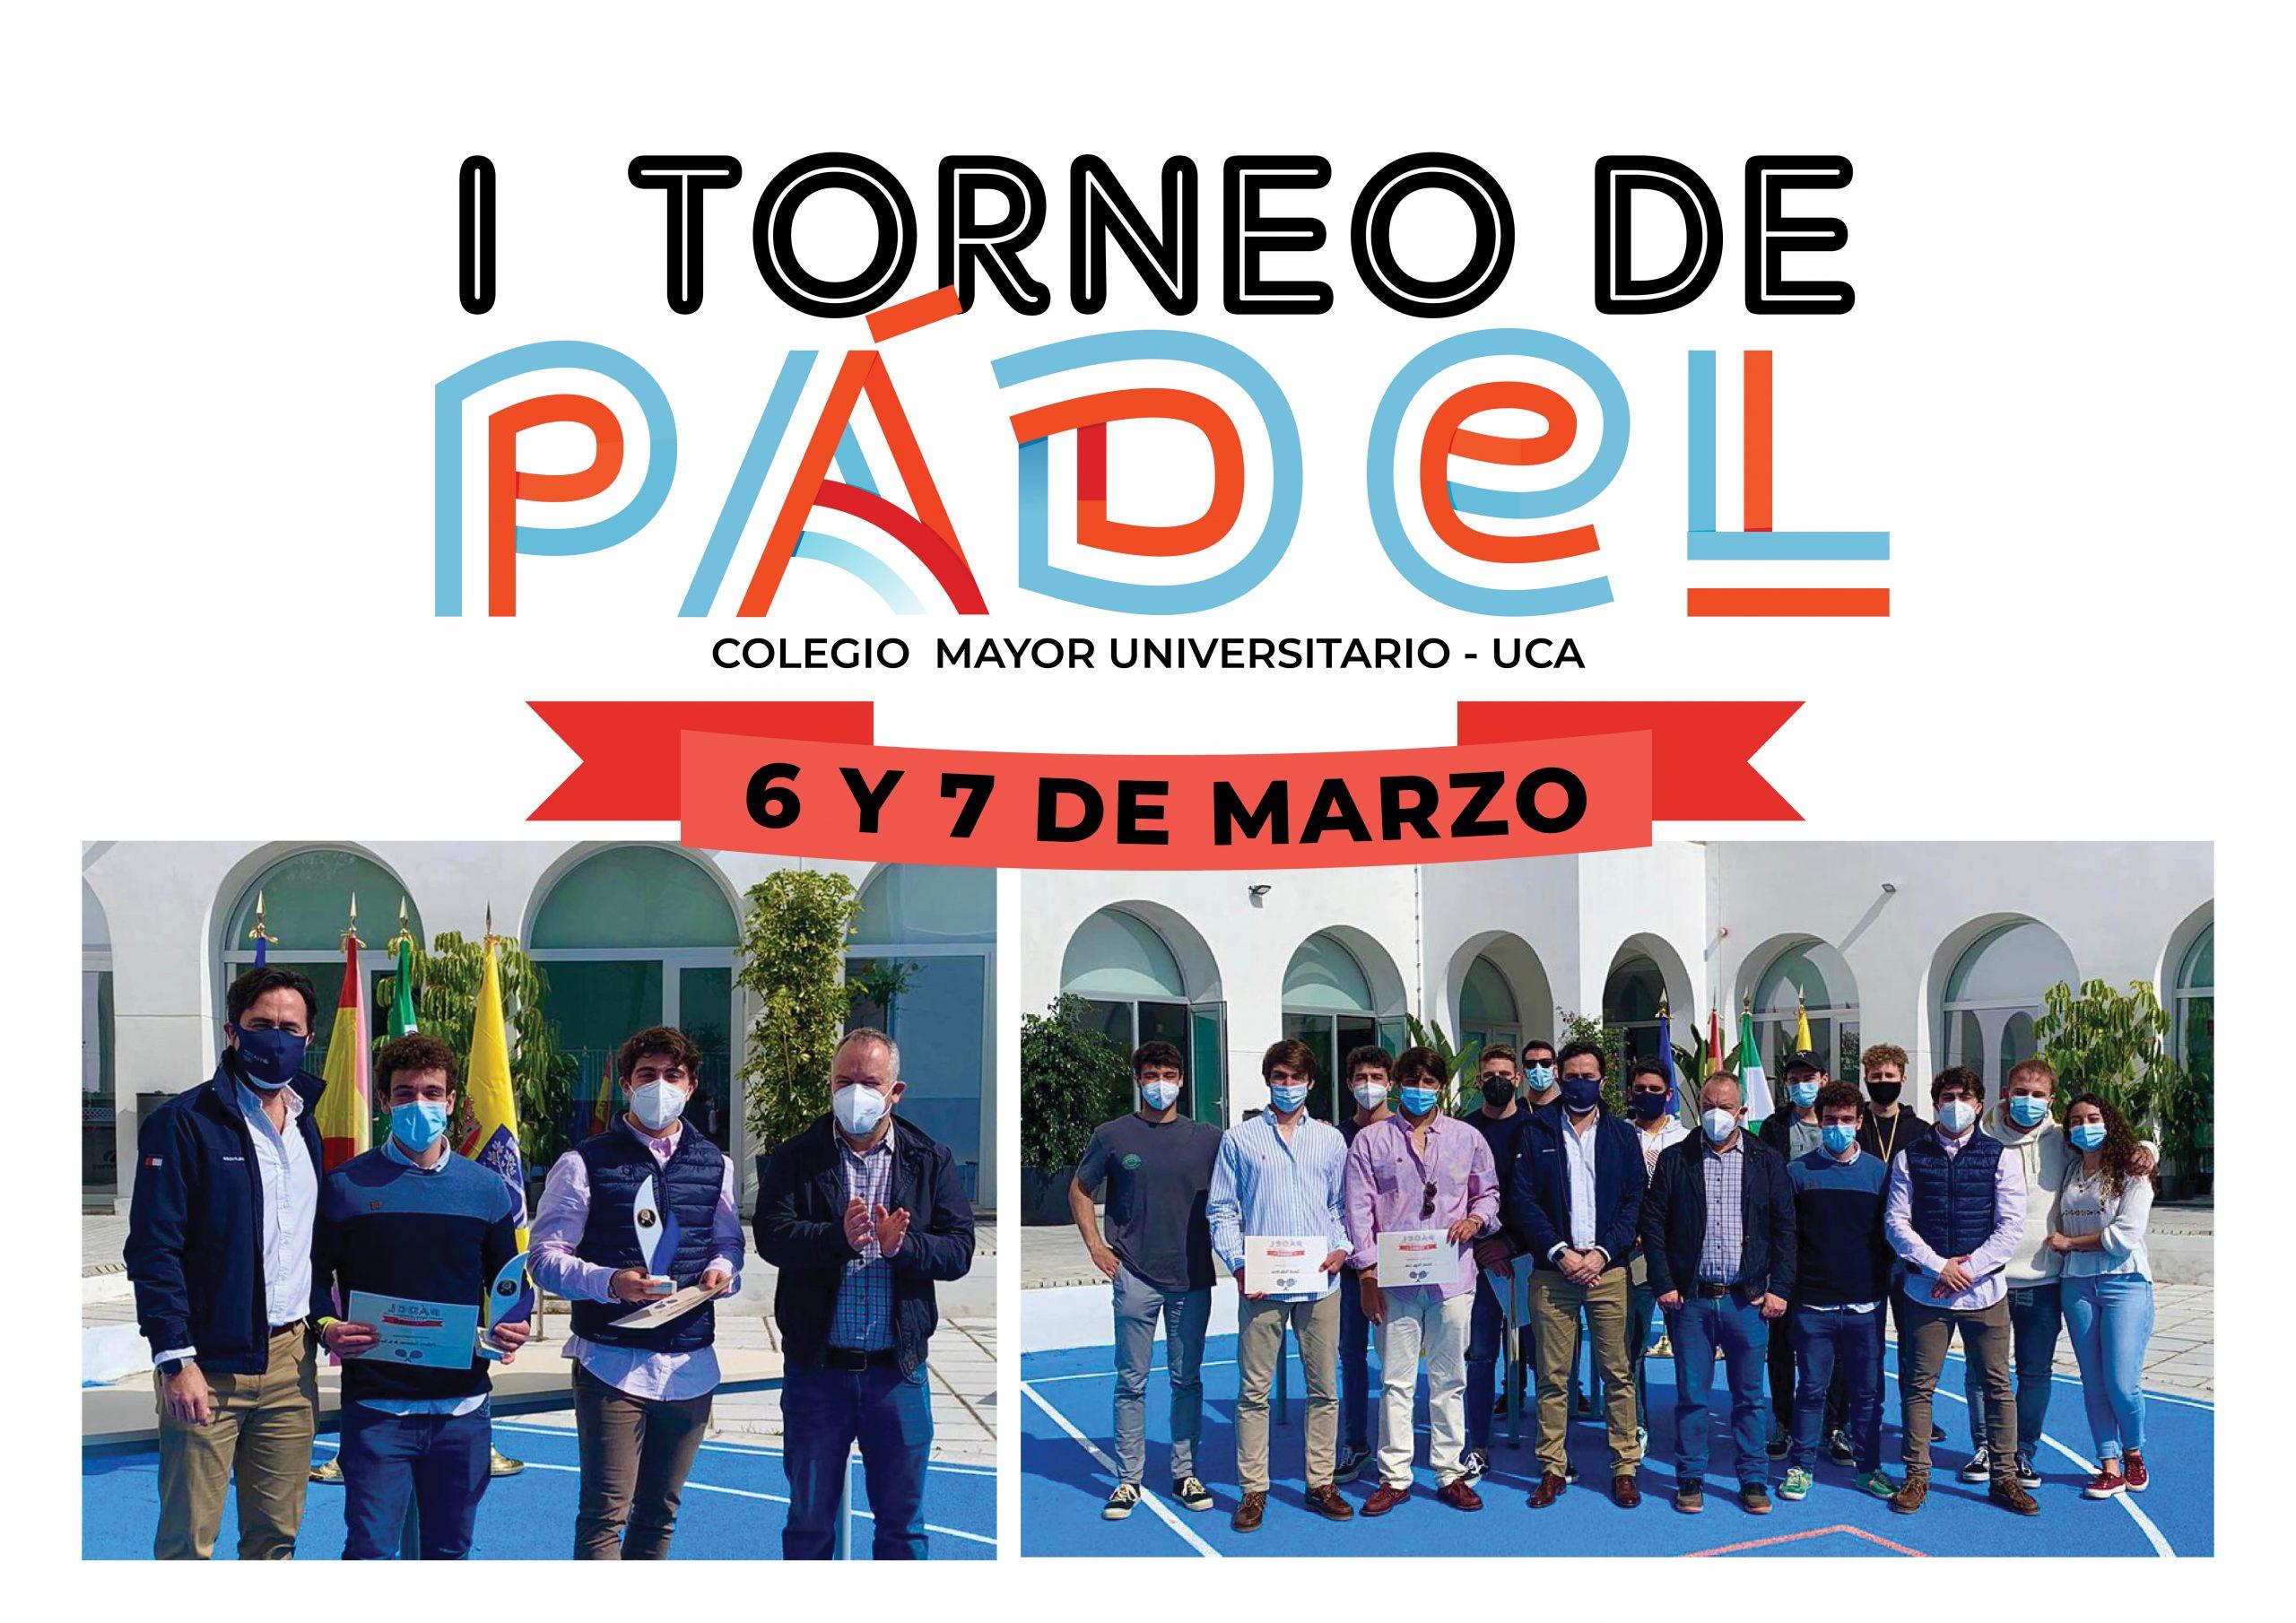 TORNEO DE PÁDEL